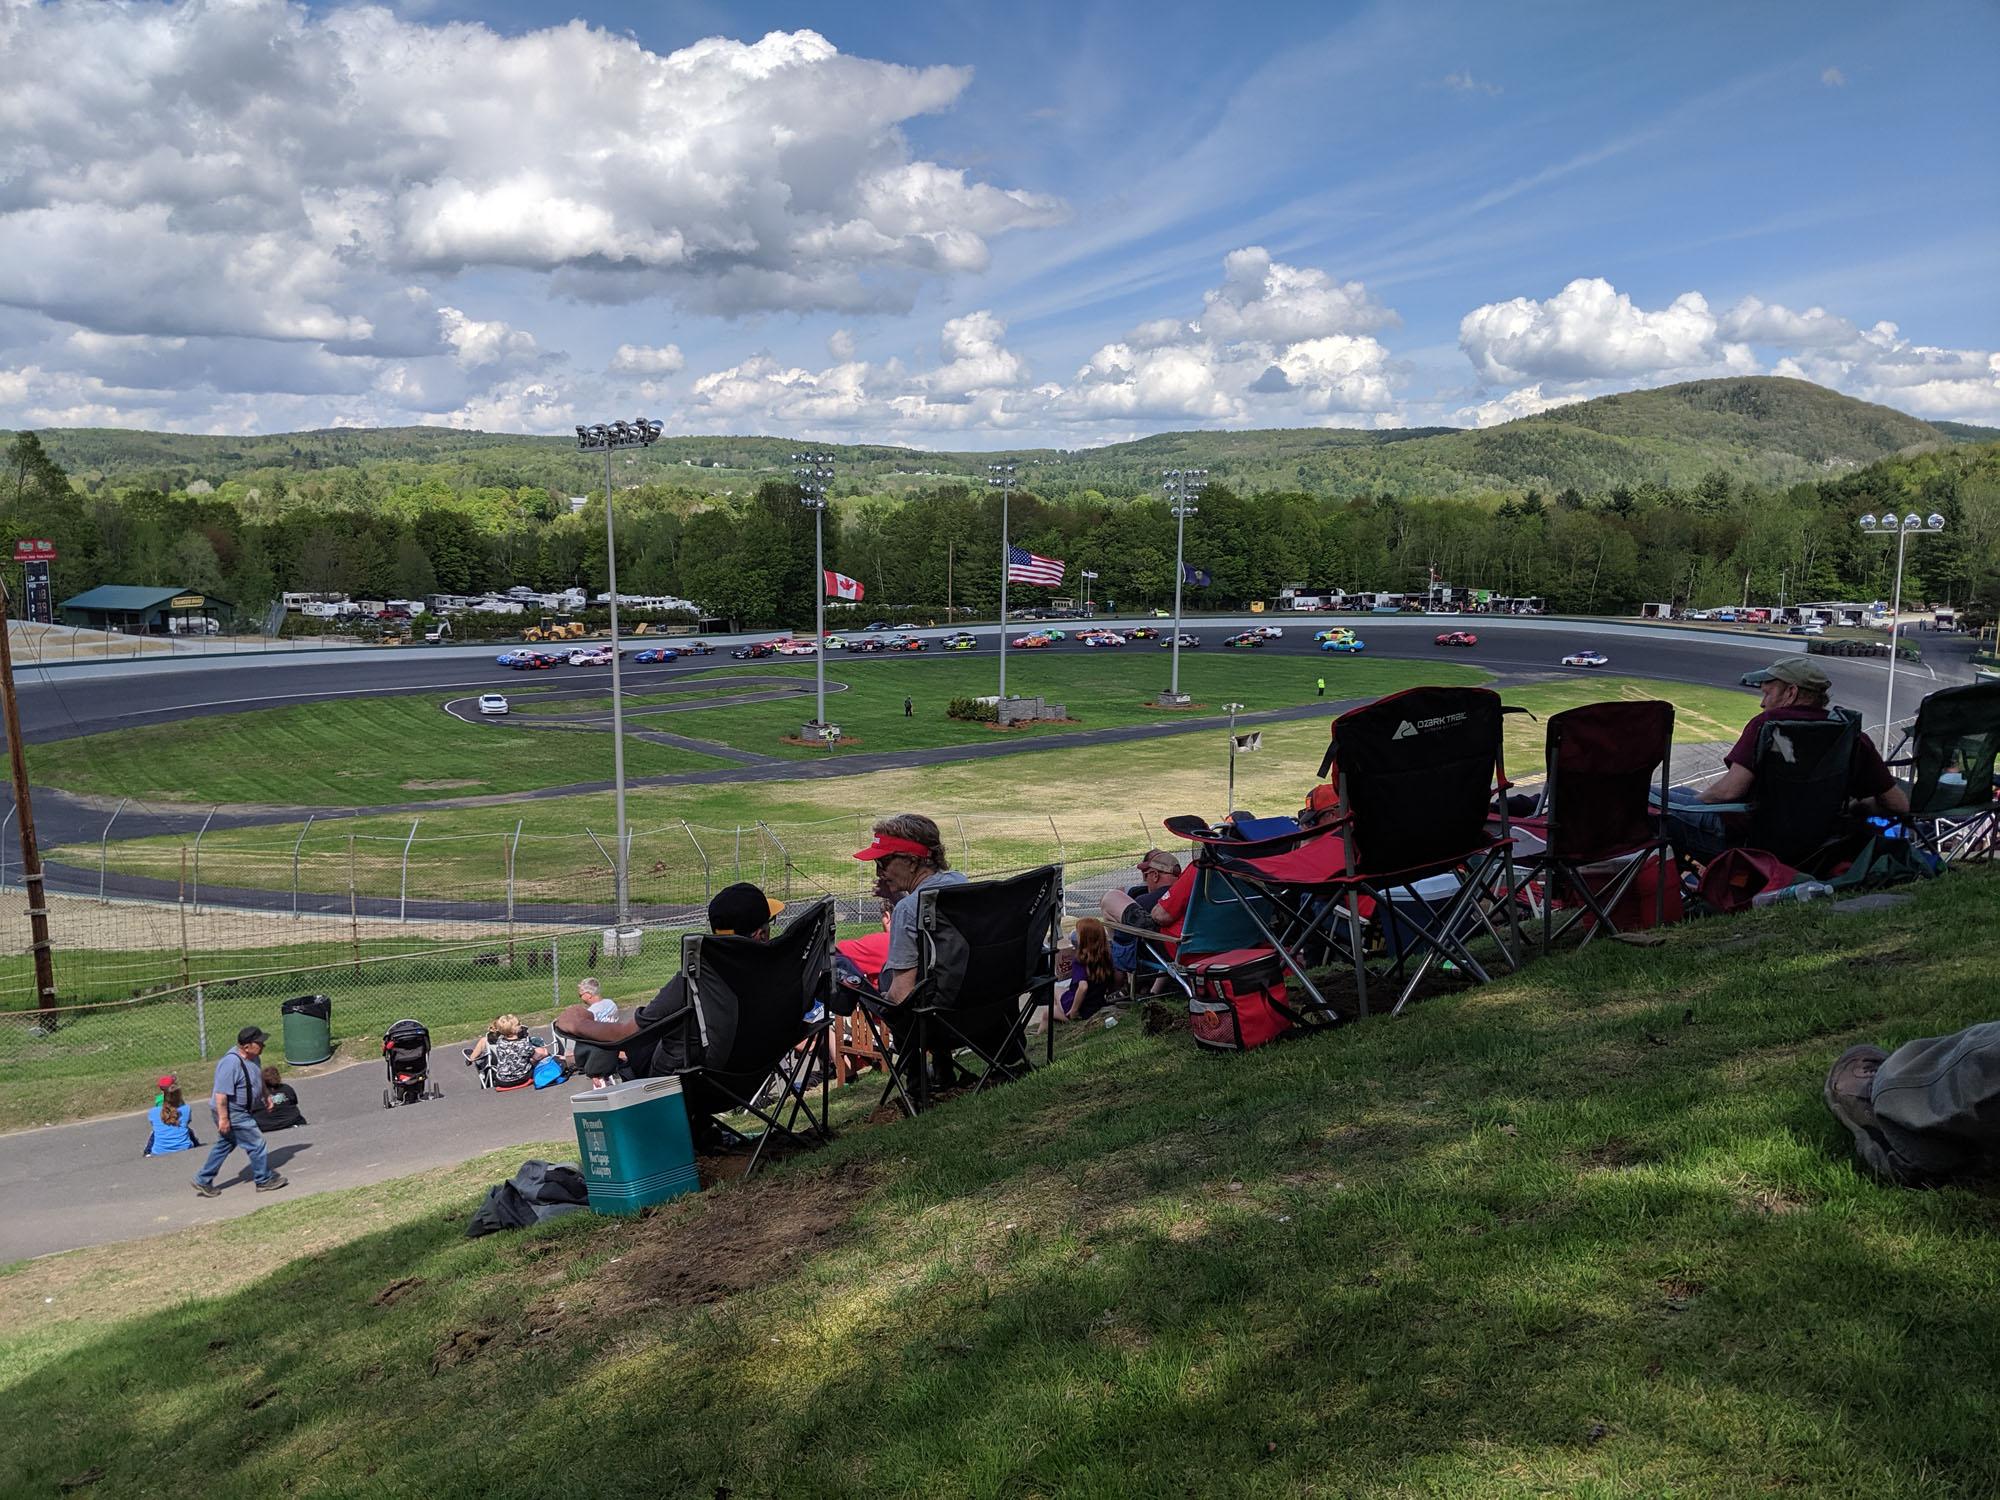 Spec Racing - Low-budget auto racing